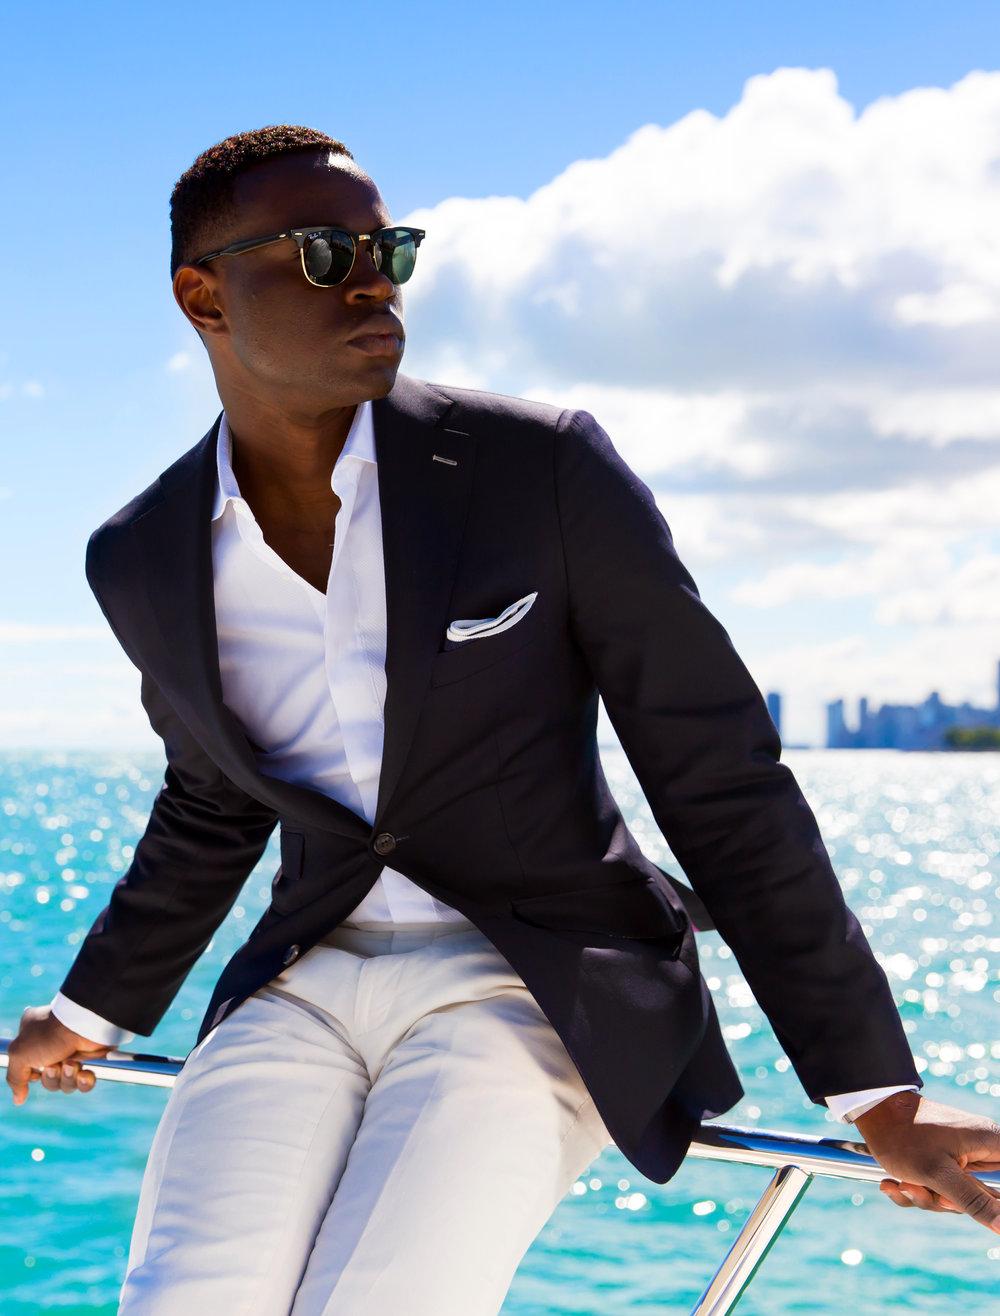 custom tailored blue blazer